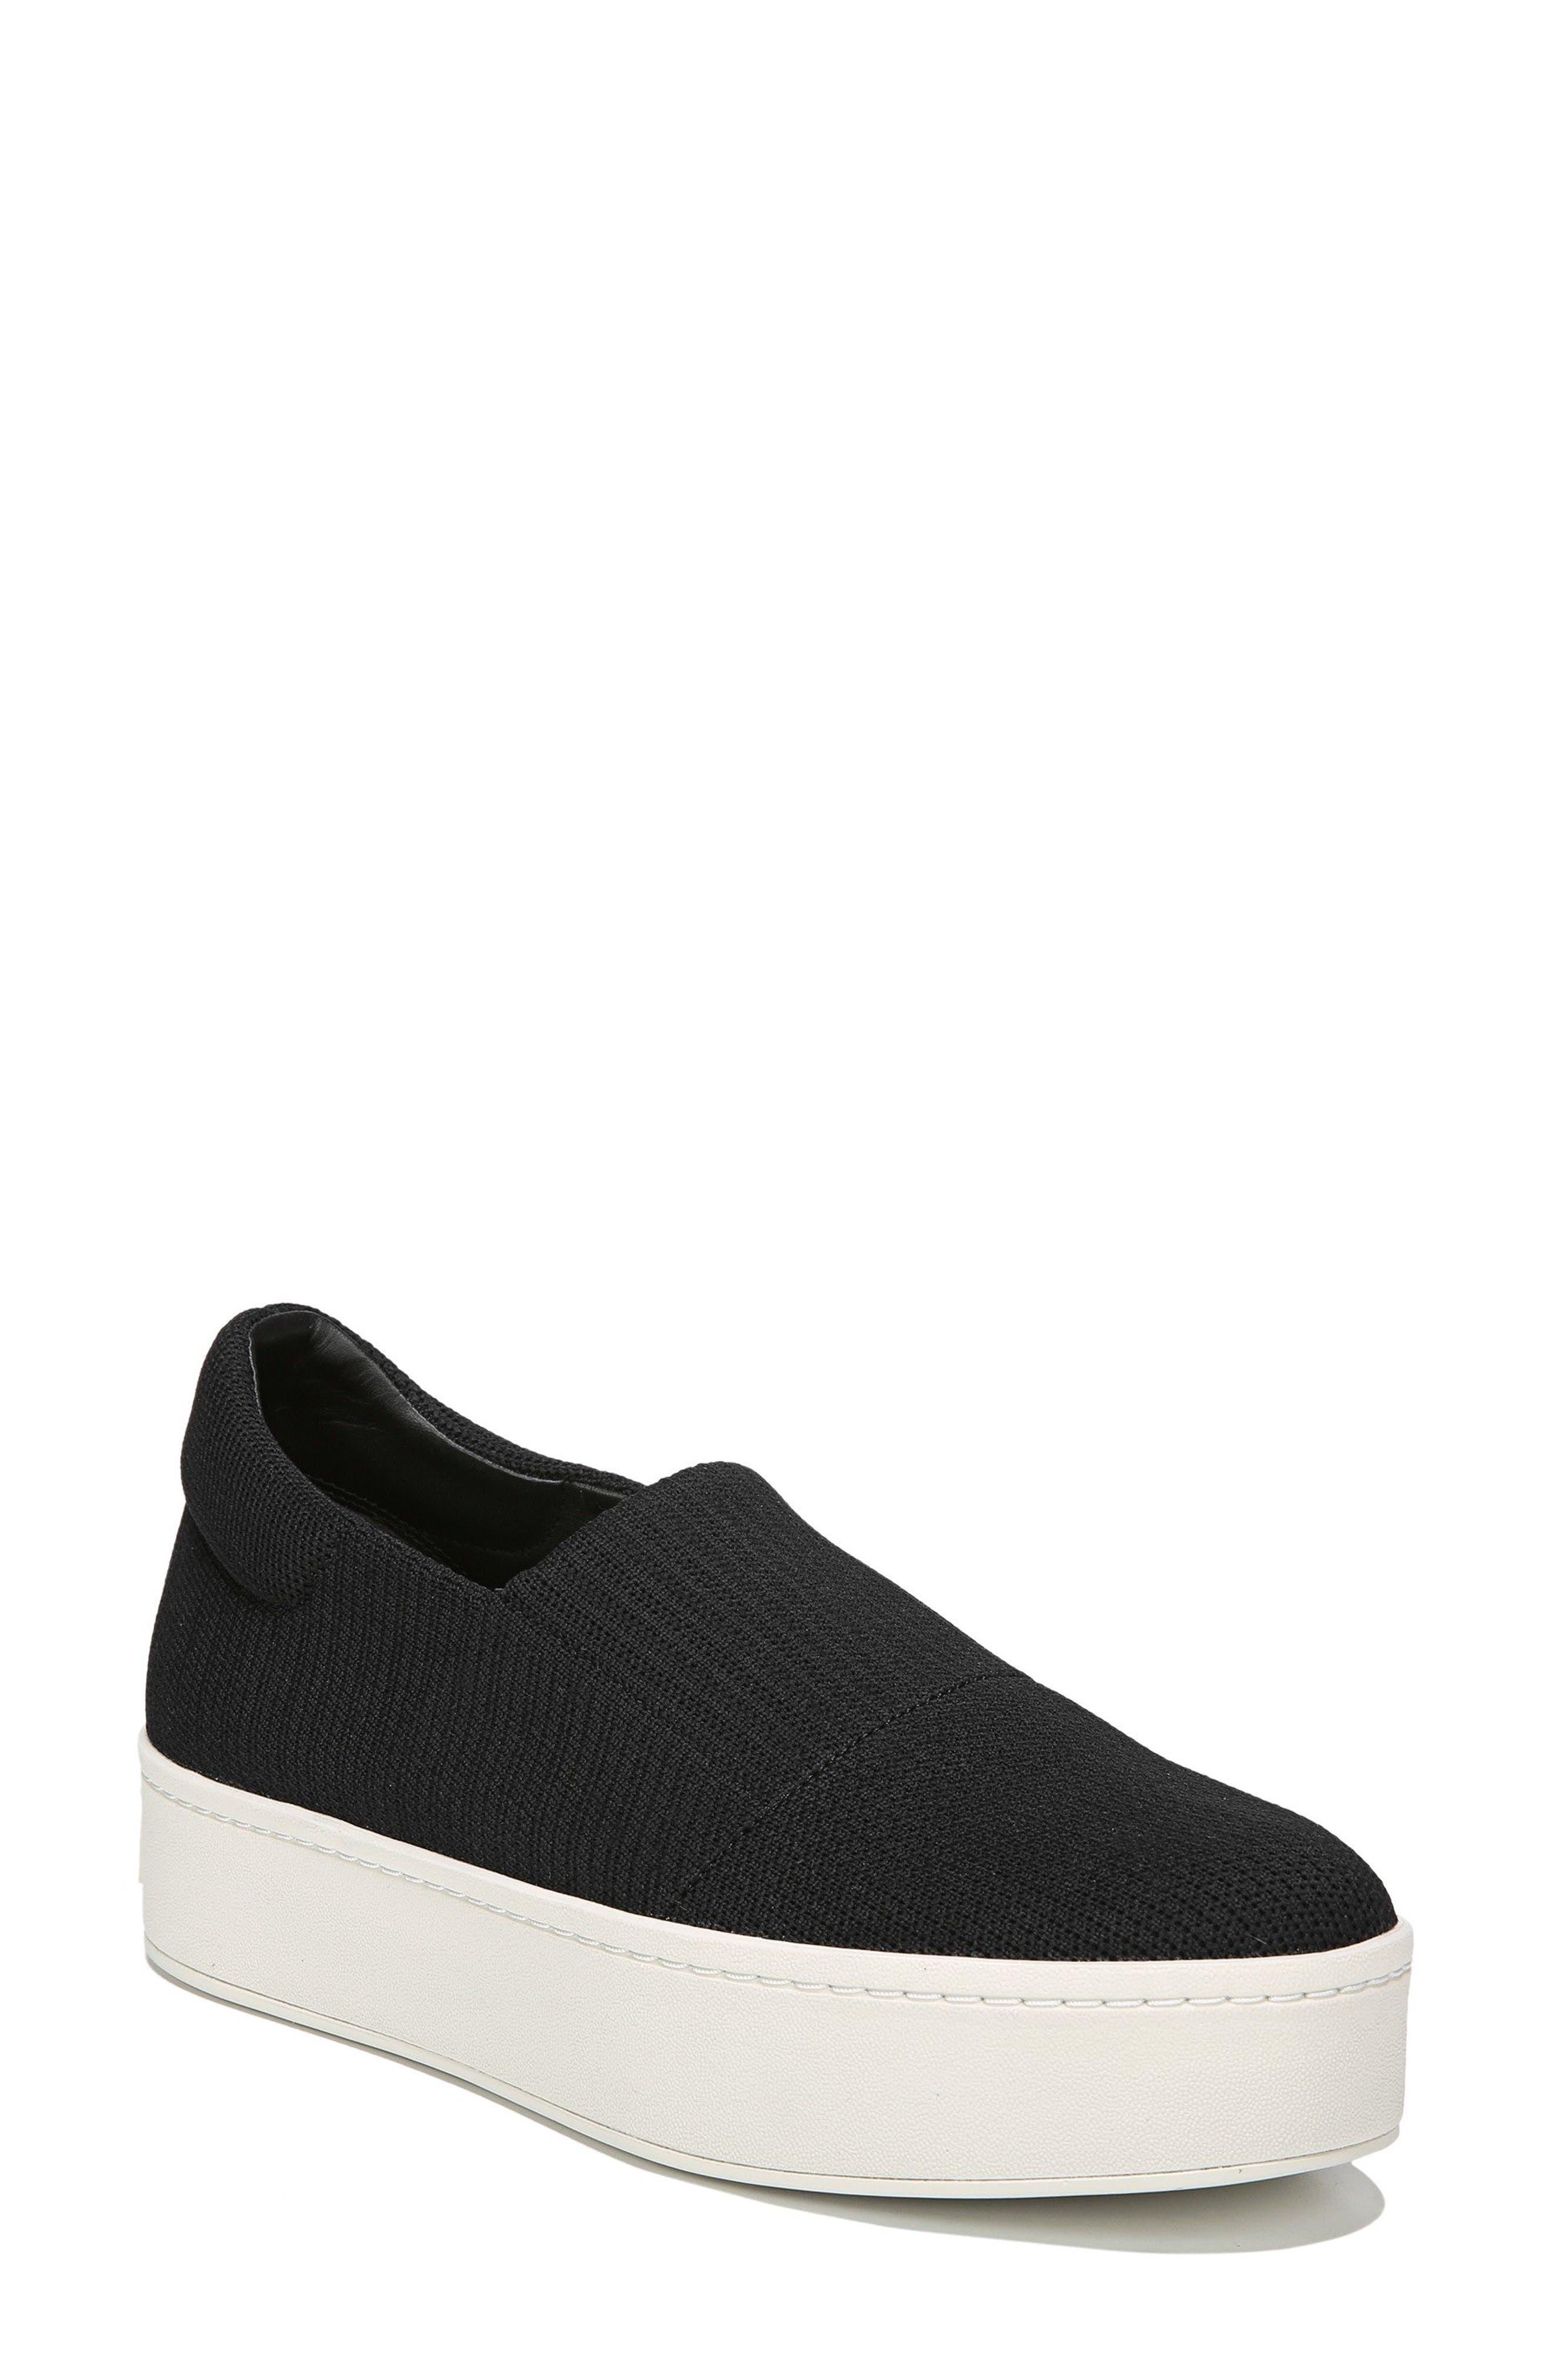 Walsh Slip-On Sneaker,                             Main thumbnail 1, color,                             001